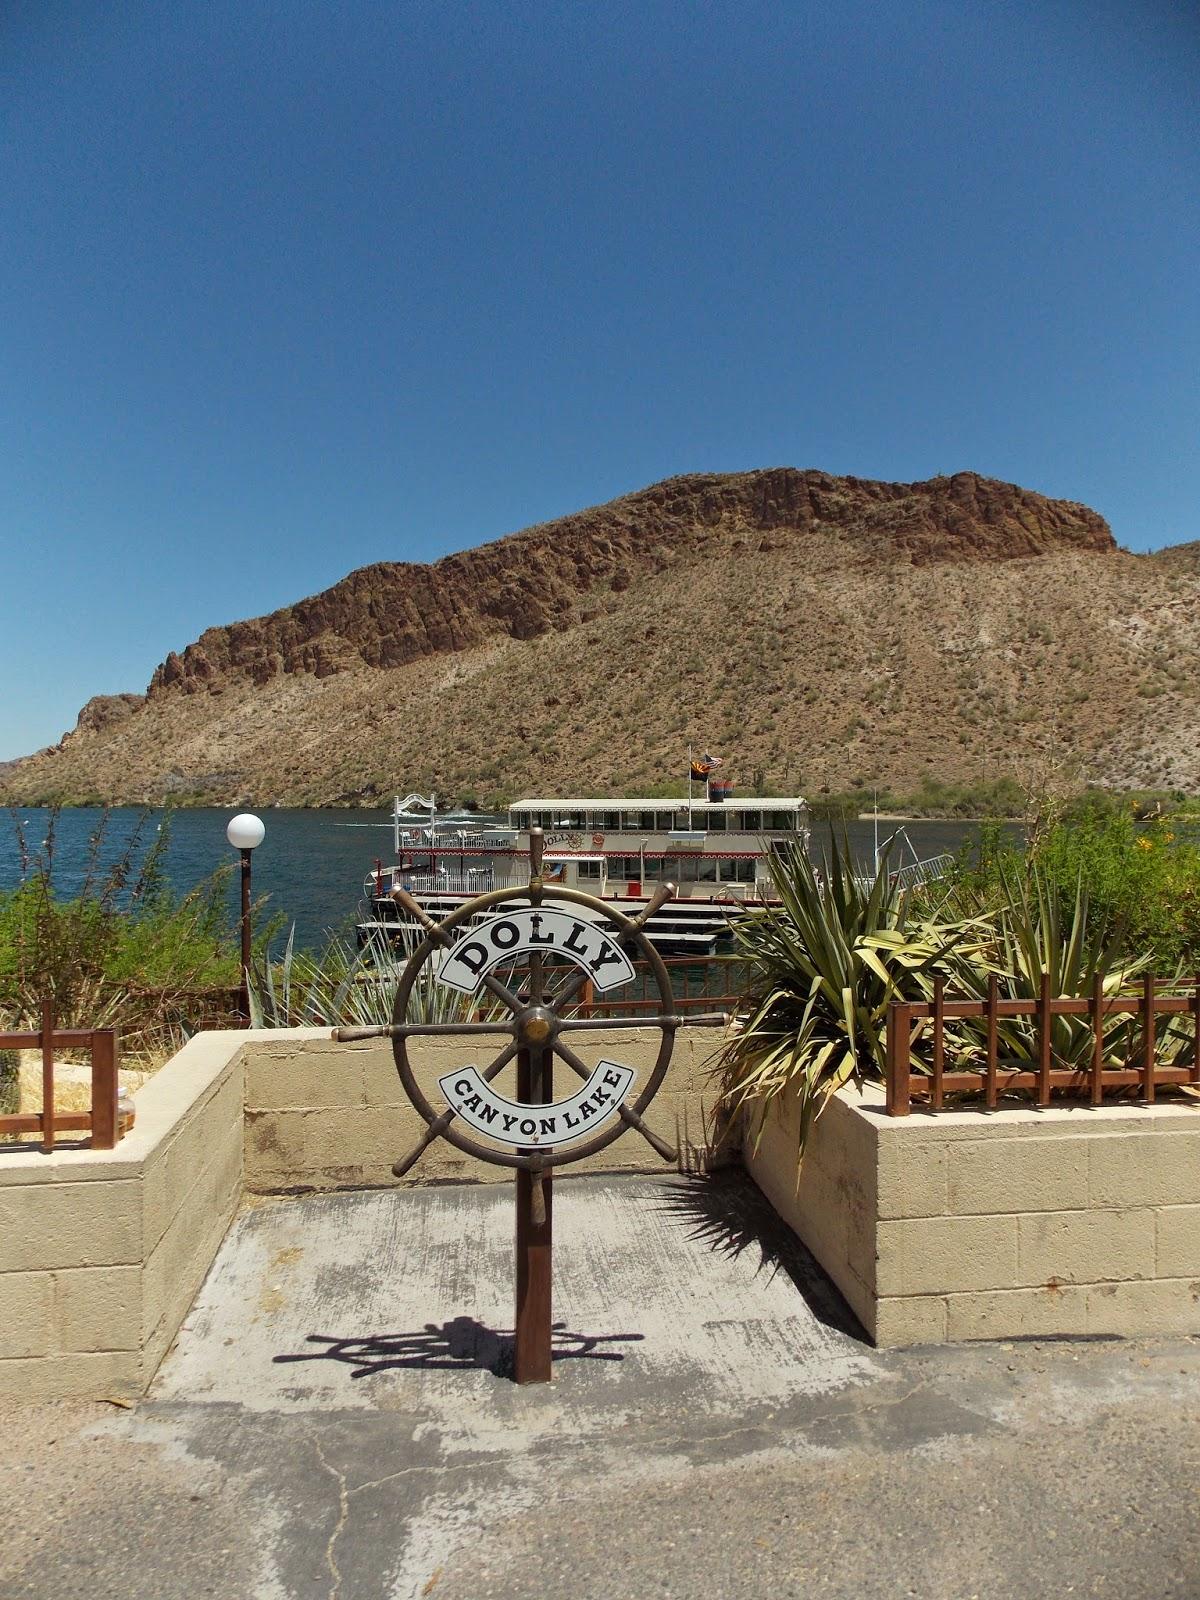 Dolly Steamboat Cruise on Canyon Lake - Floradise